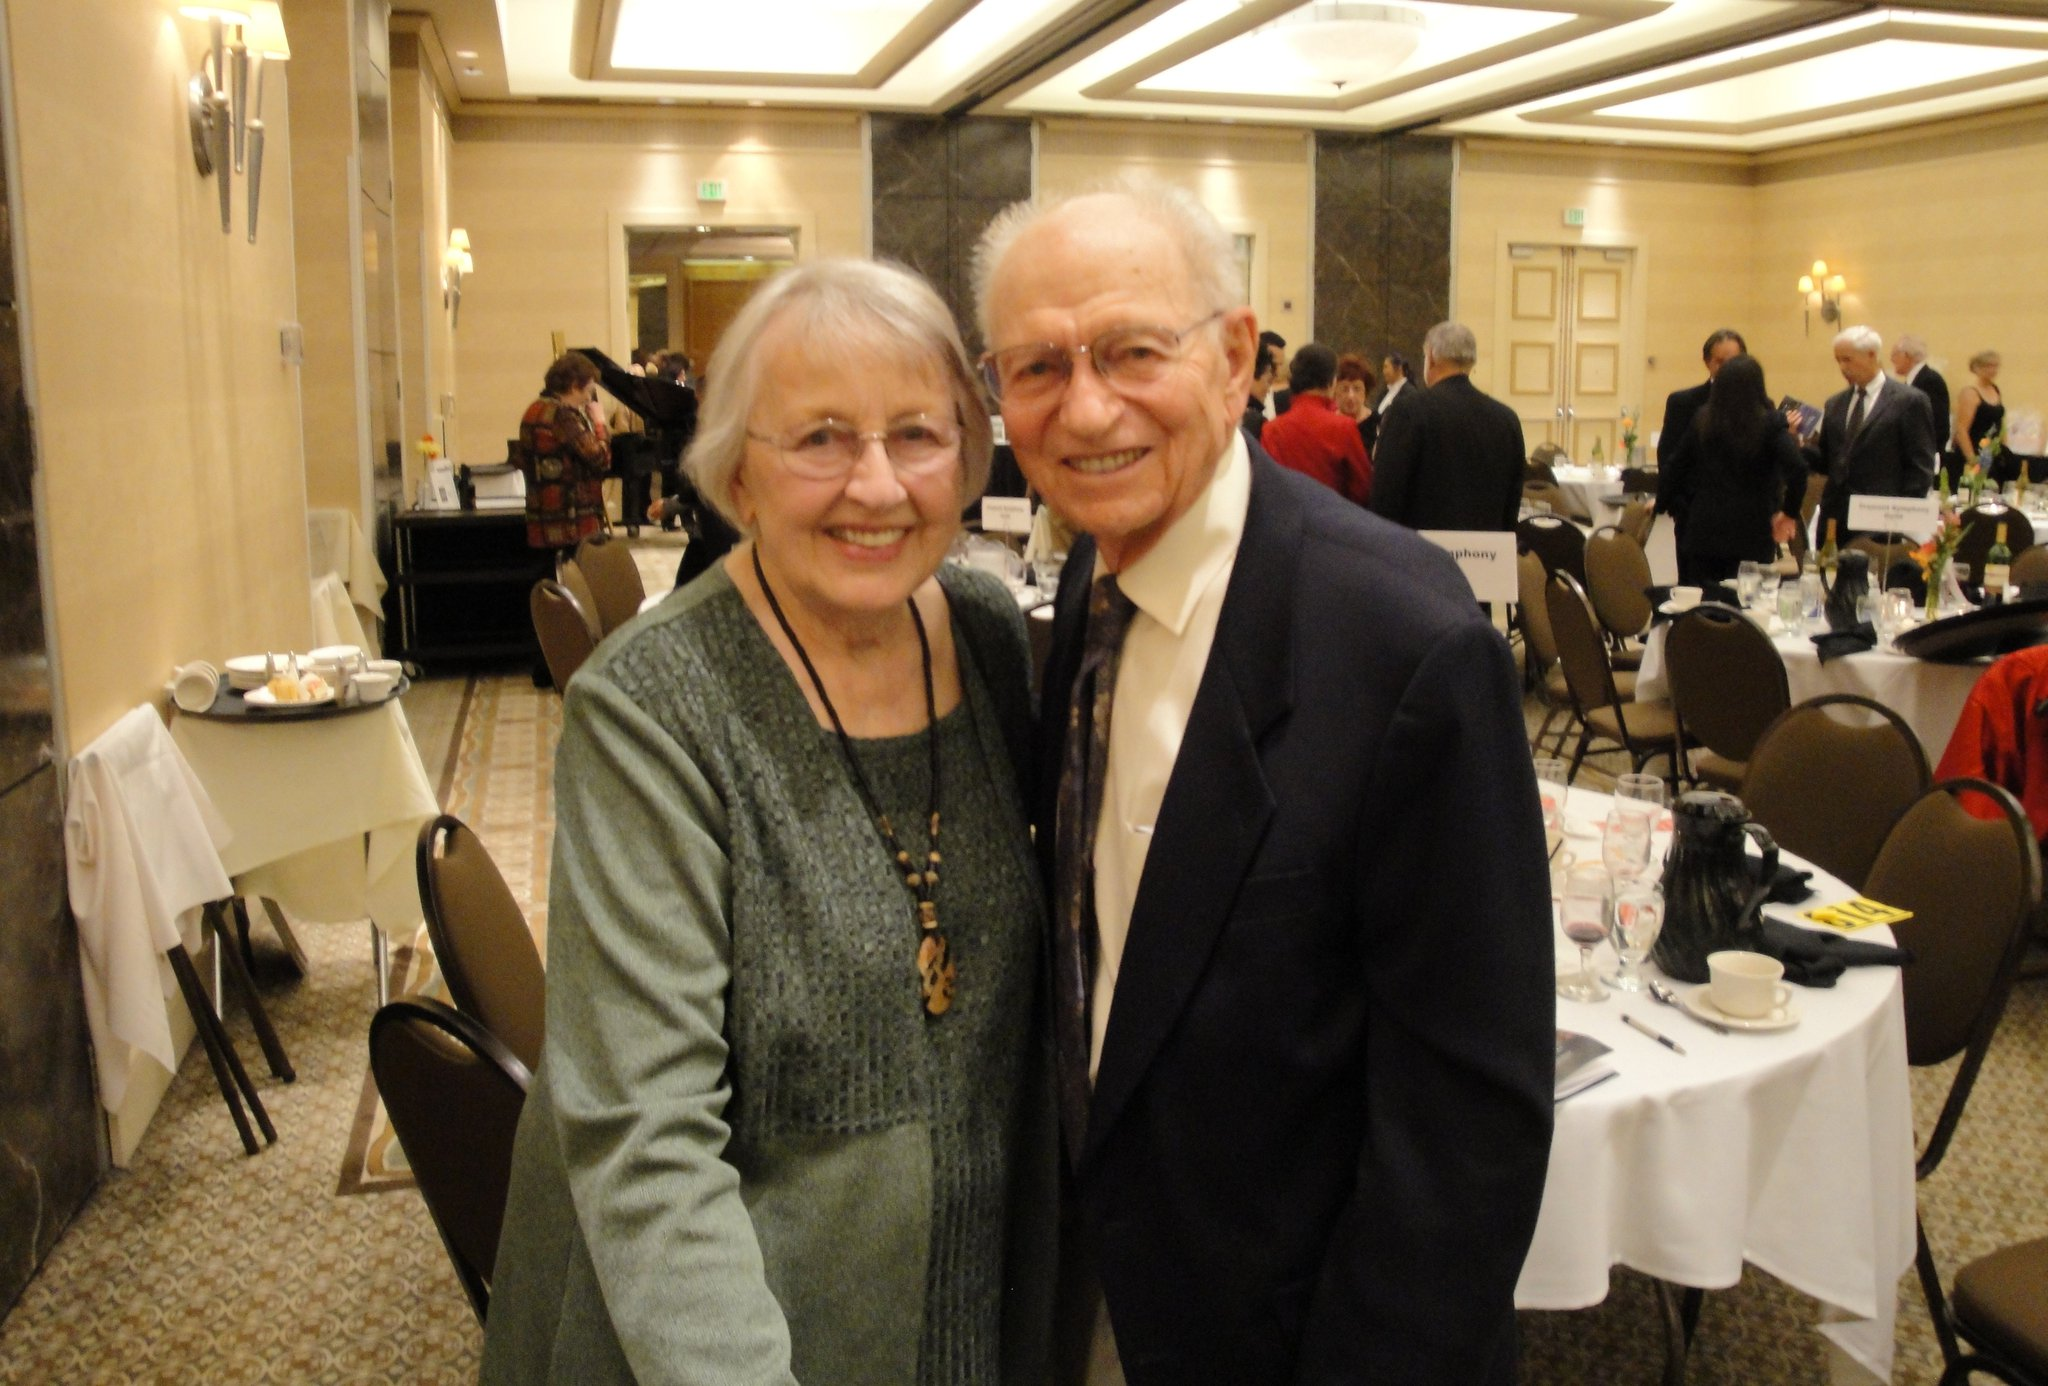 Alvin and Caryl Dockter Fremont Symphony Event 2010.jpg